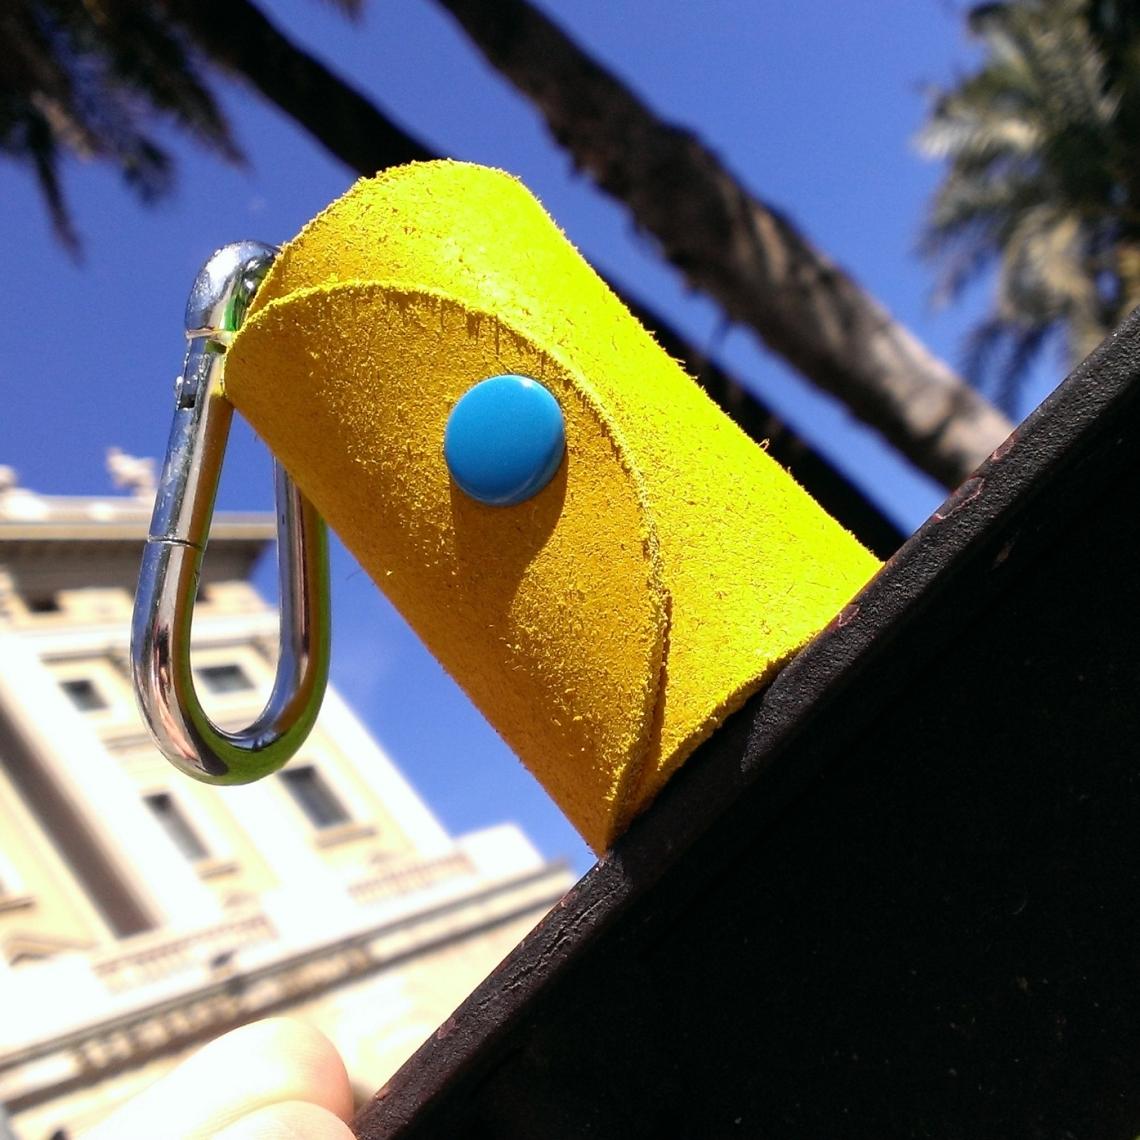 TheCrazyTube in Barcelona